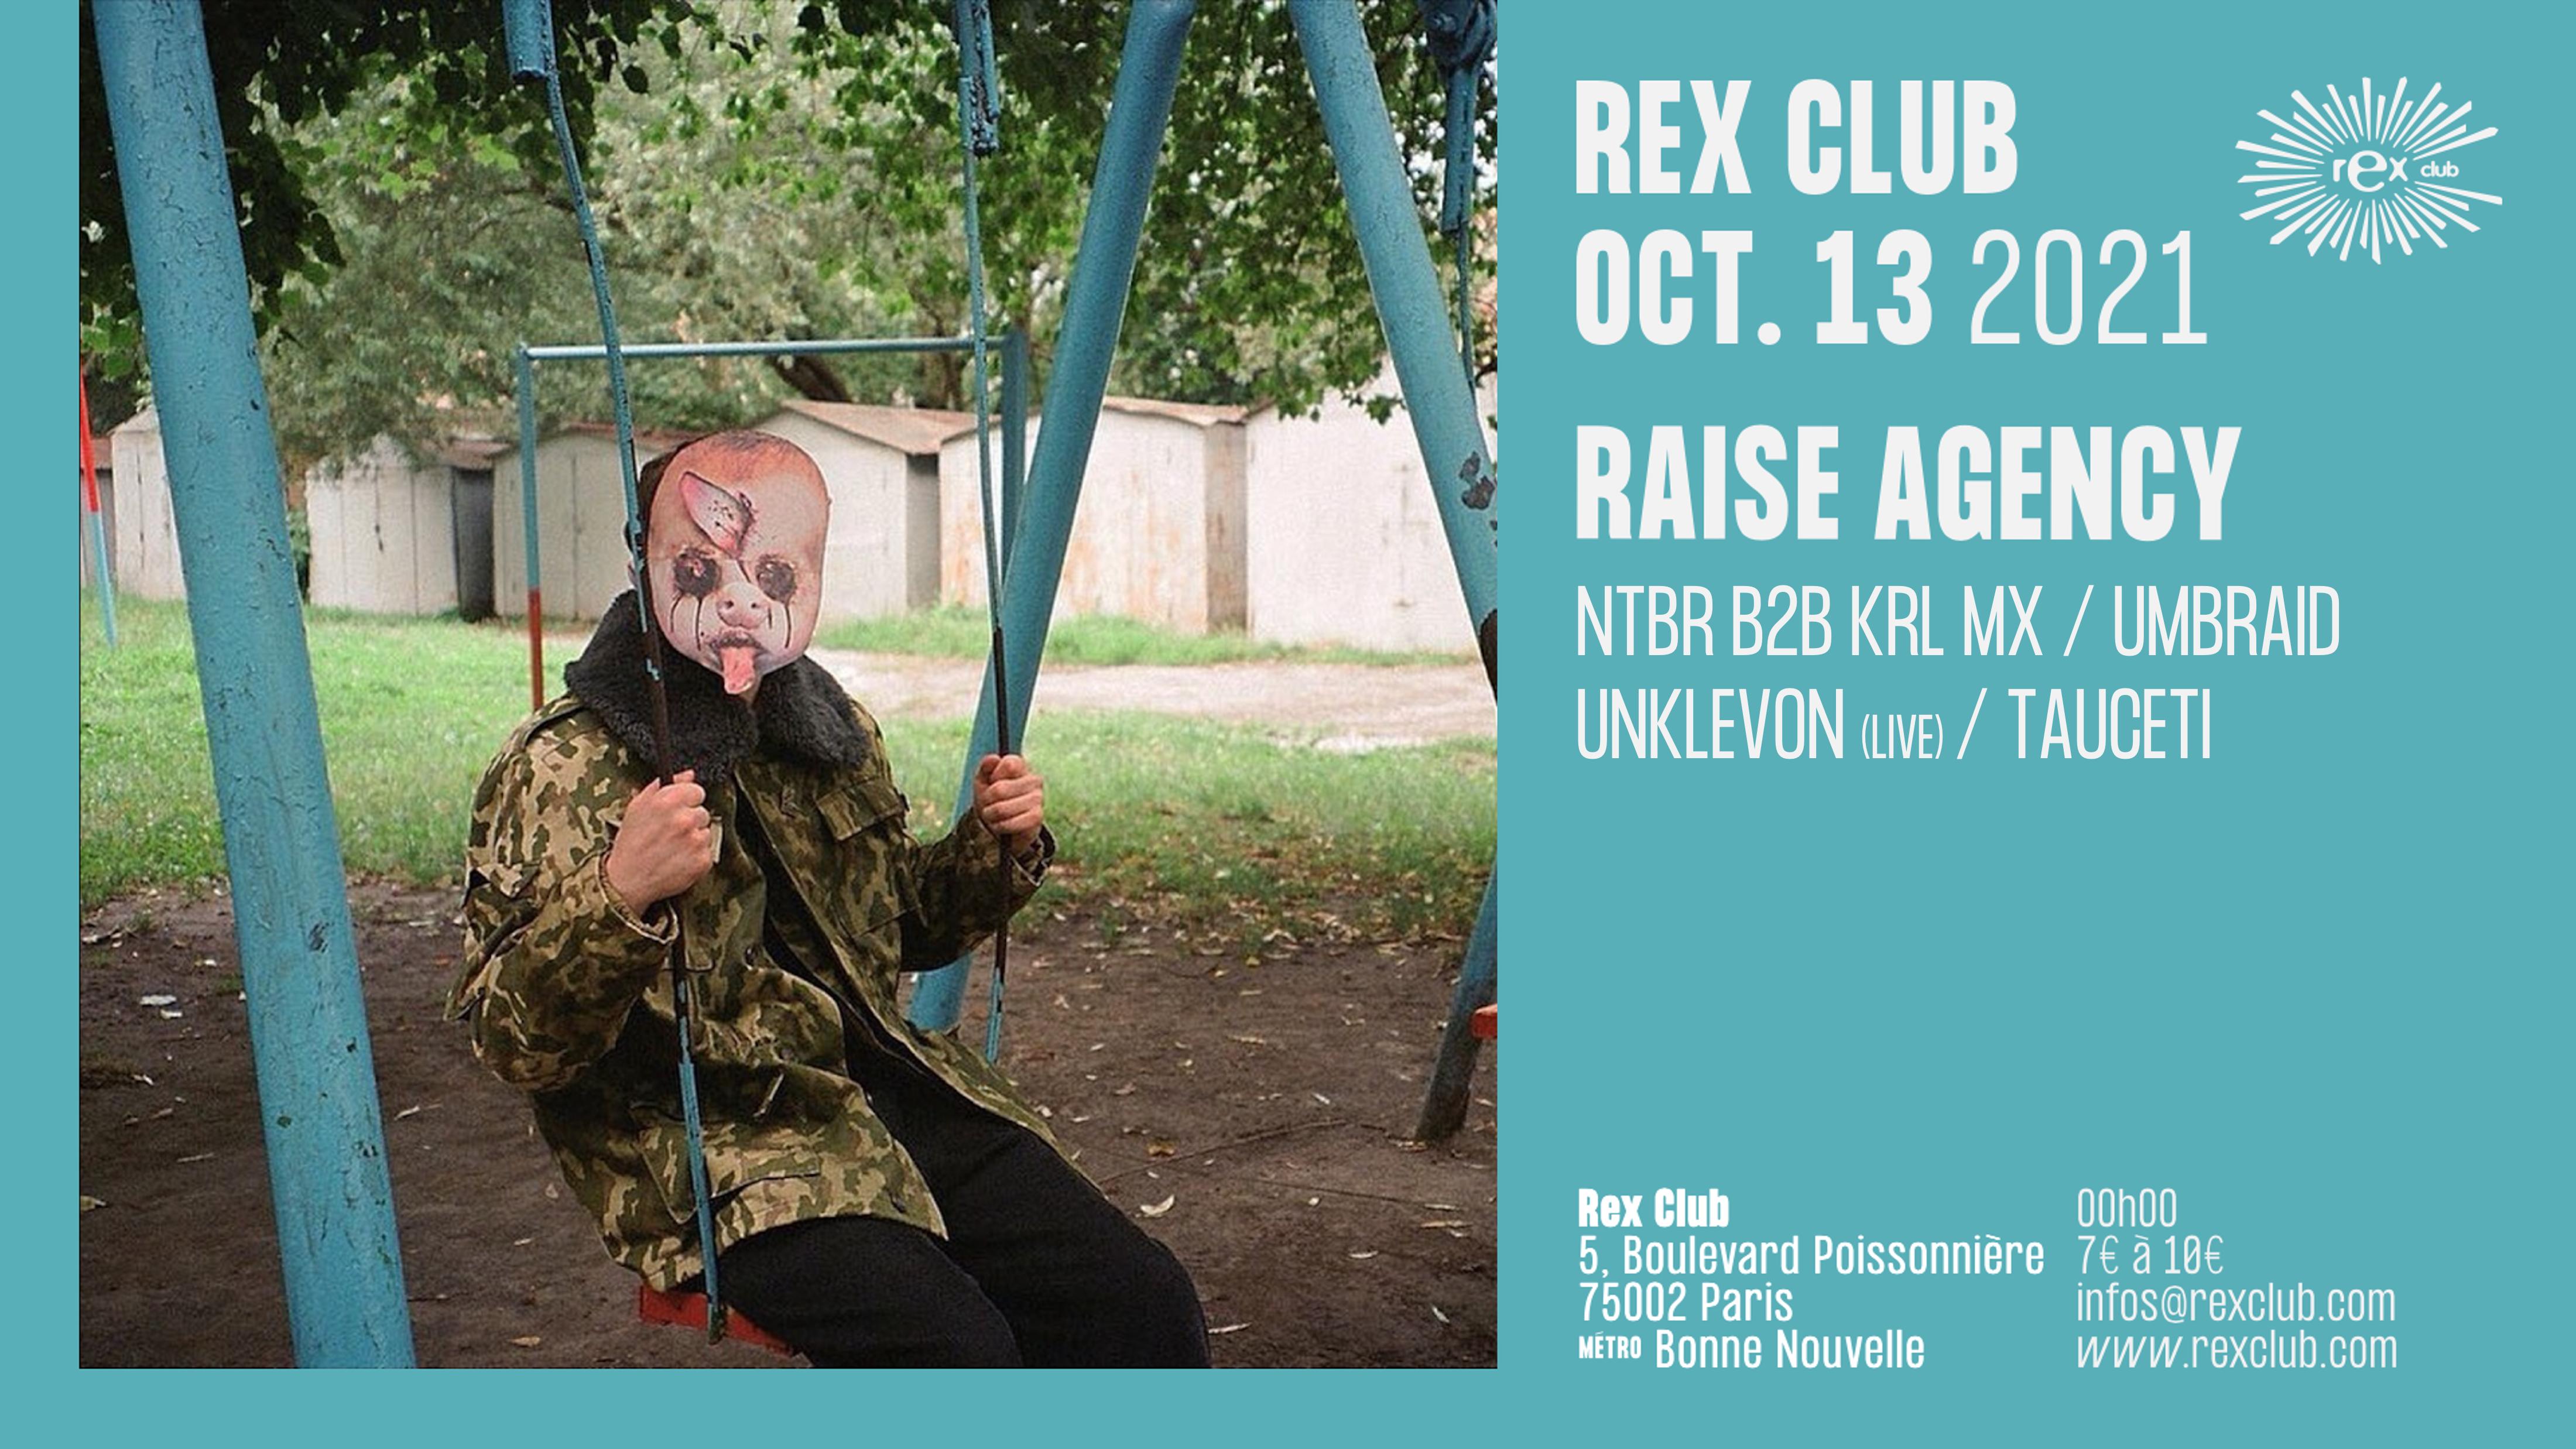 Raise Agency: NTBR b2b KRL MX, UMBRAID, UNKLEVON Live & more